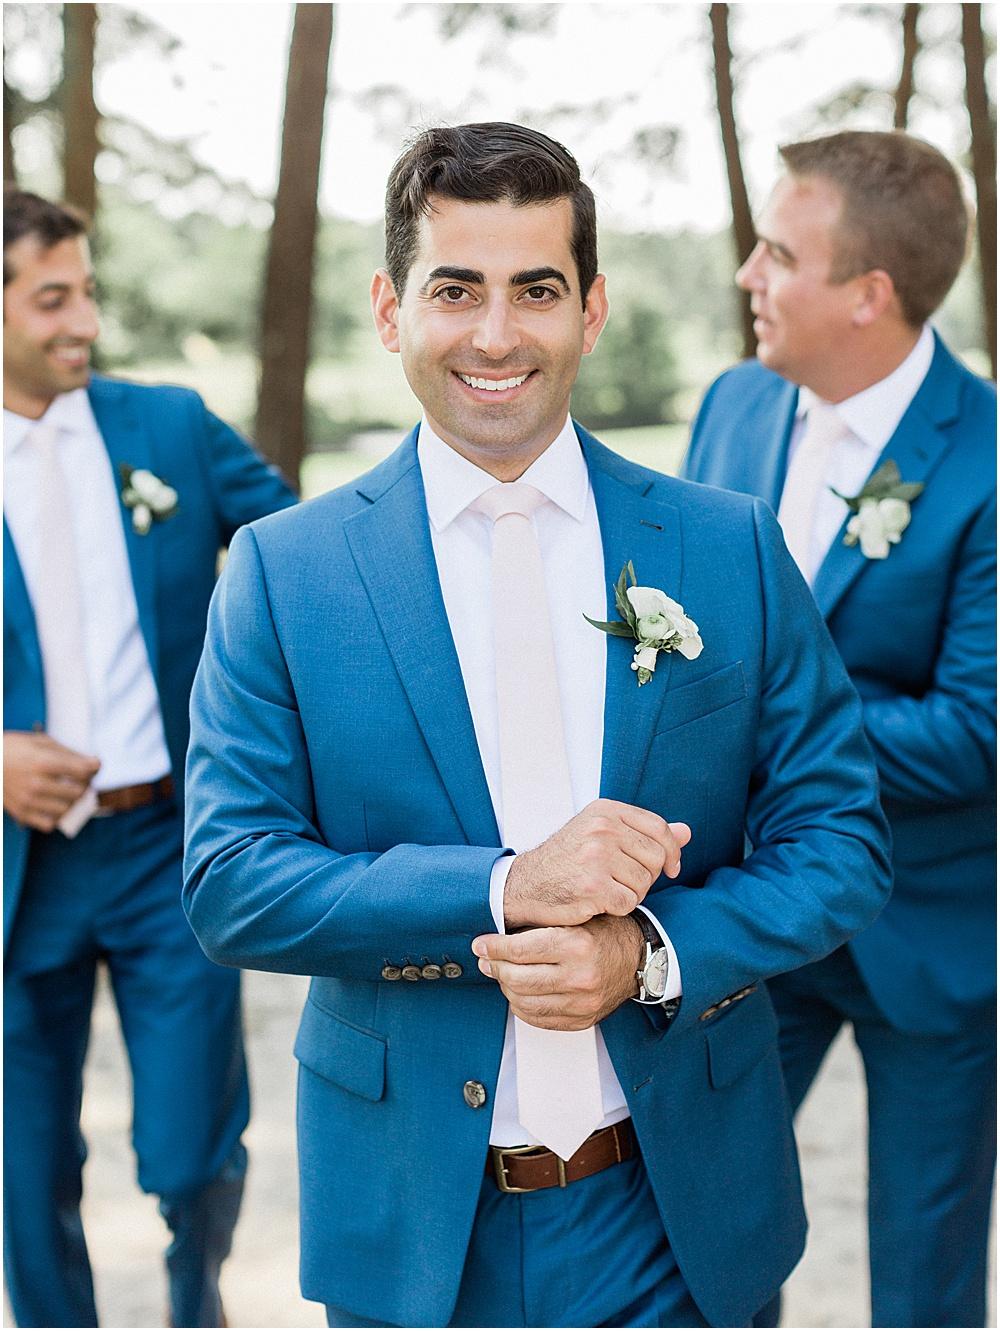 willowbend_country_club_colleen_brett_wild_dahlia_cw_events_cape_cod_massachusetts_boston_wedding_photographer_meredith_jane_photography_photo_0582.jpg